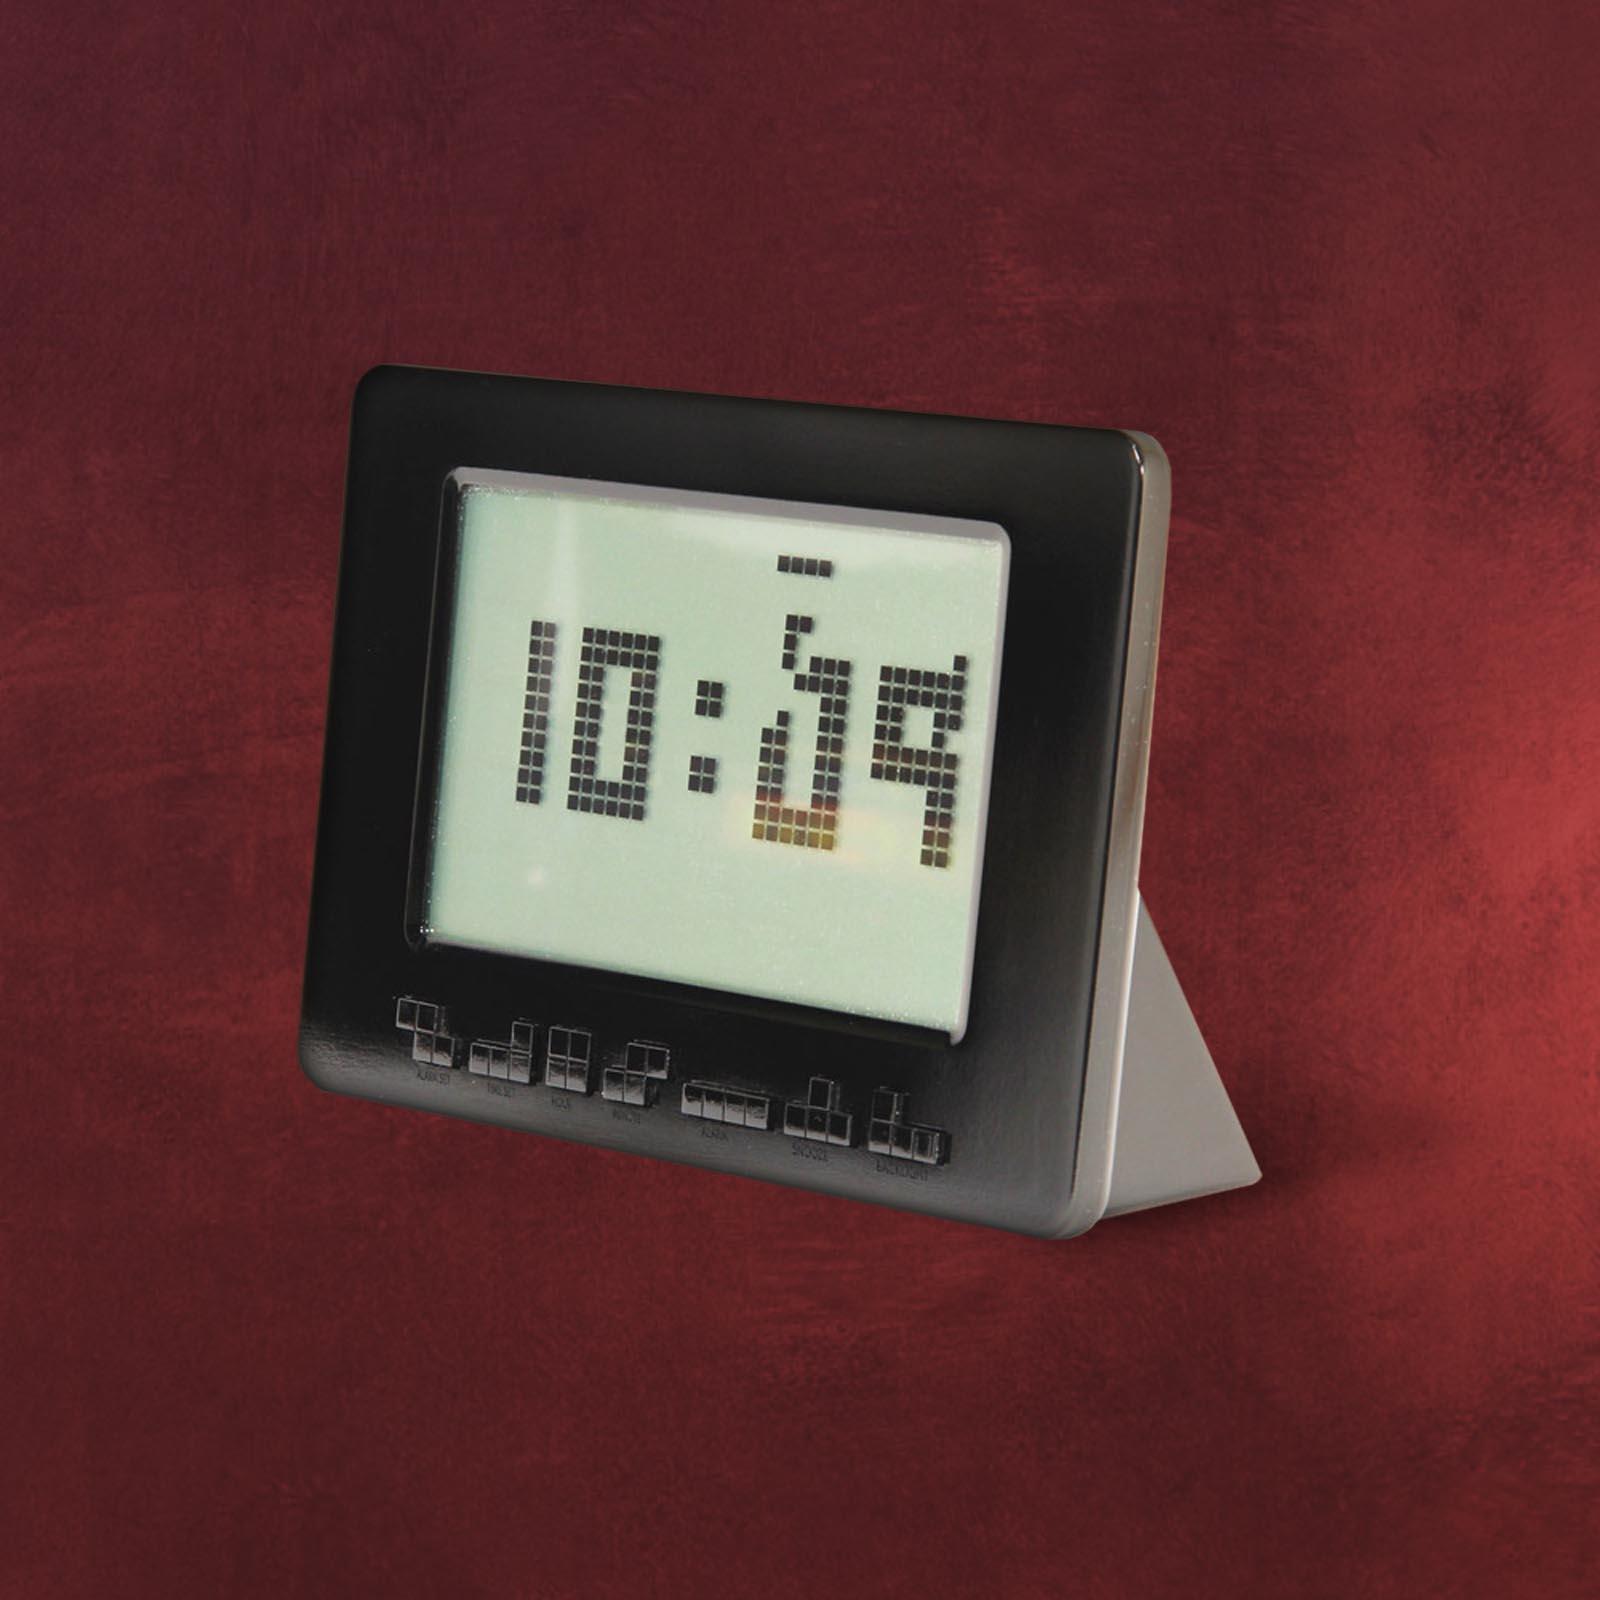 tetris melodie